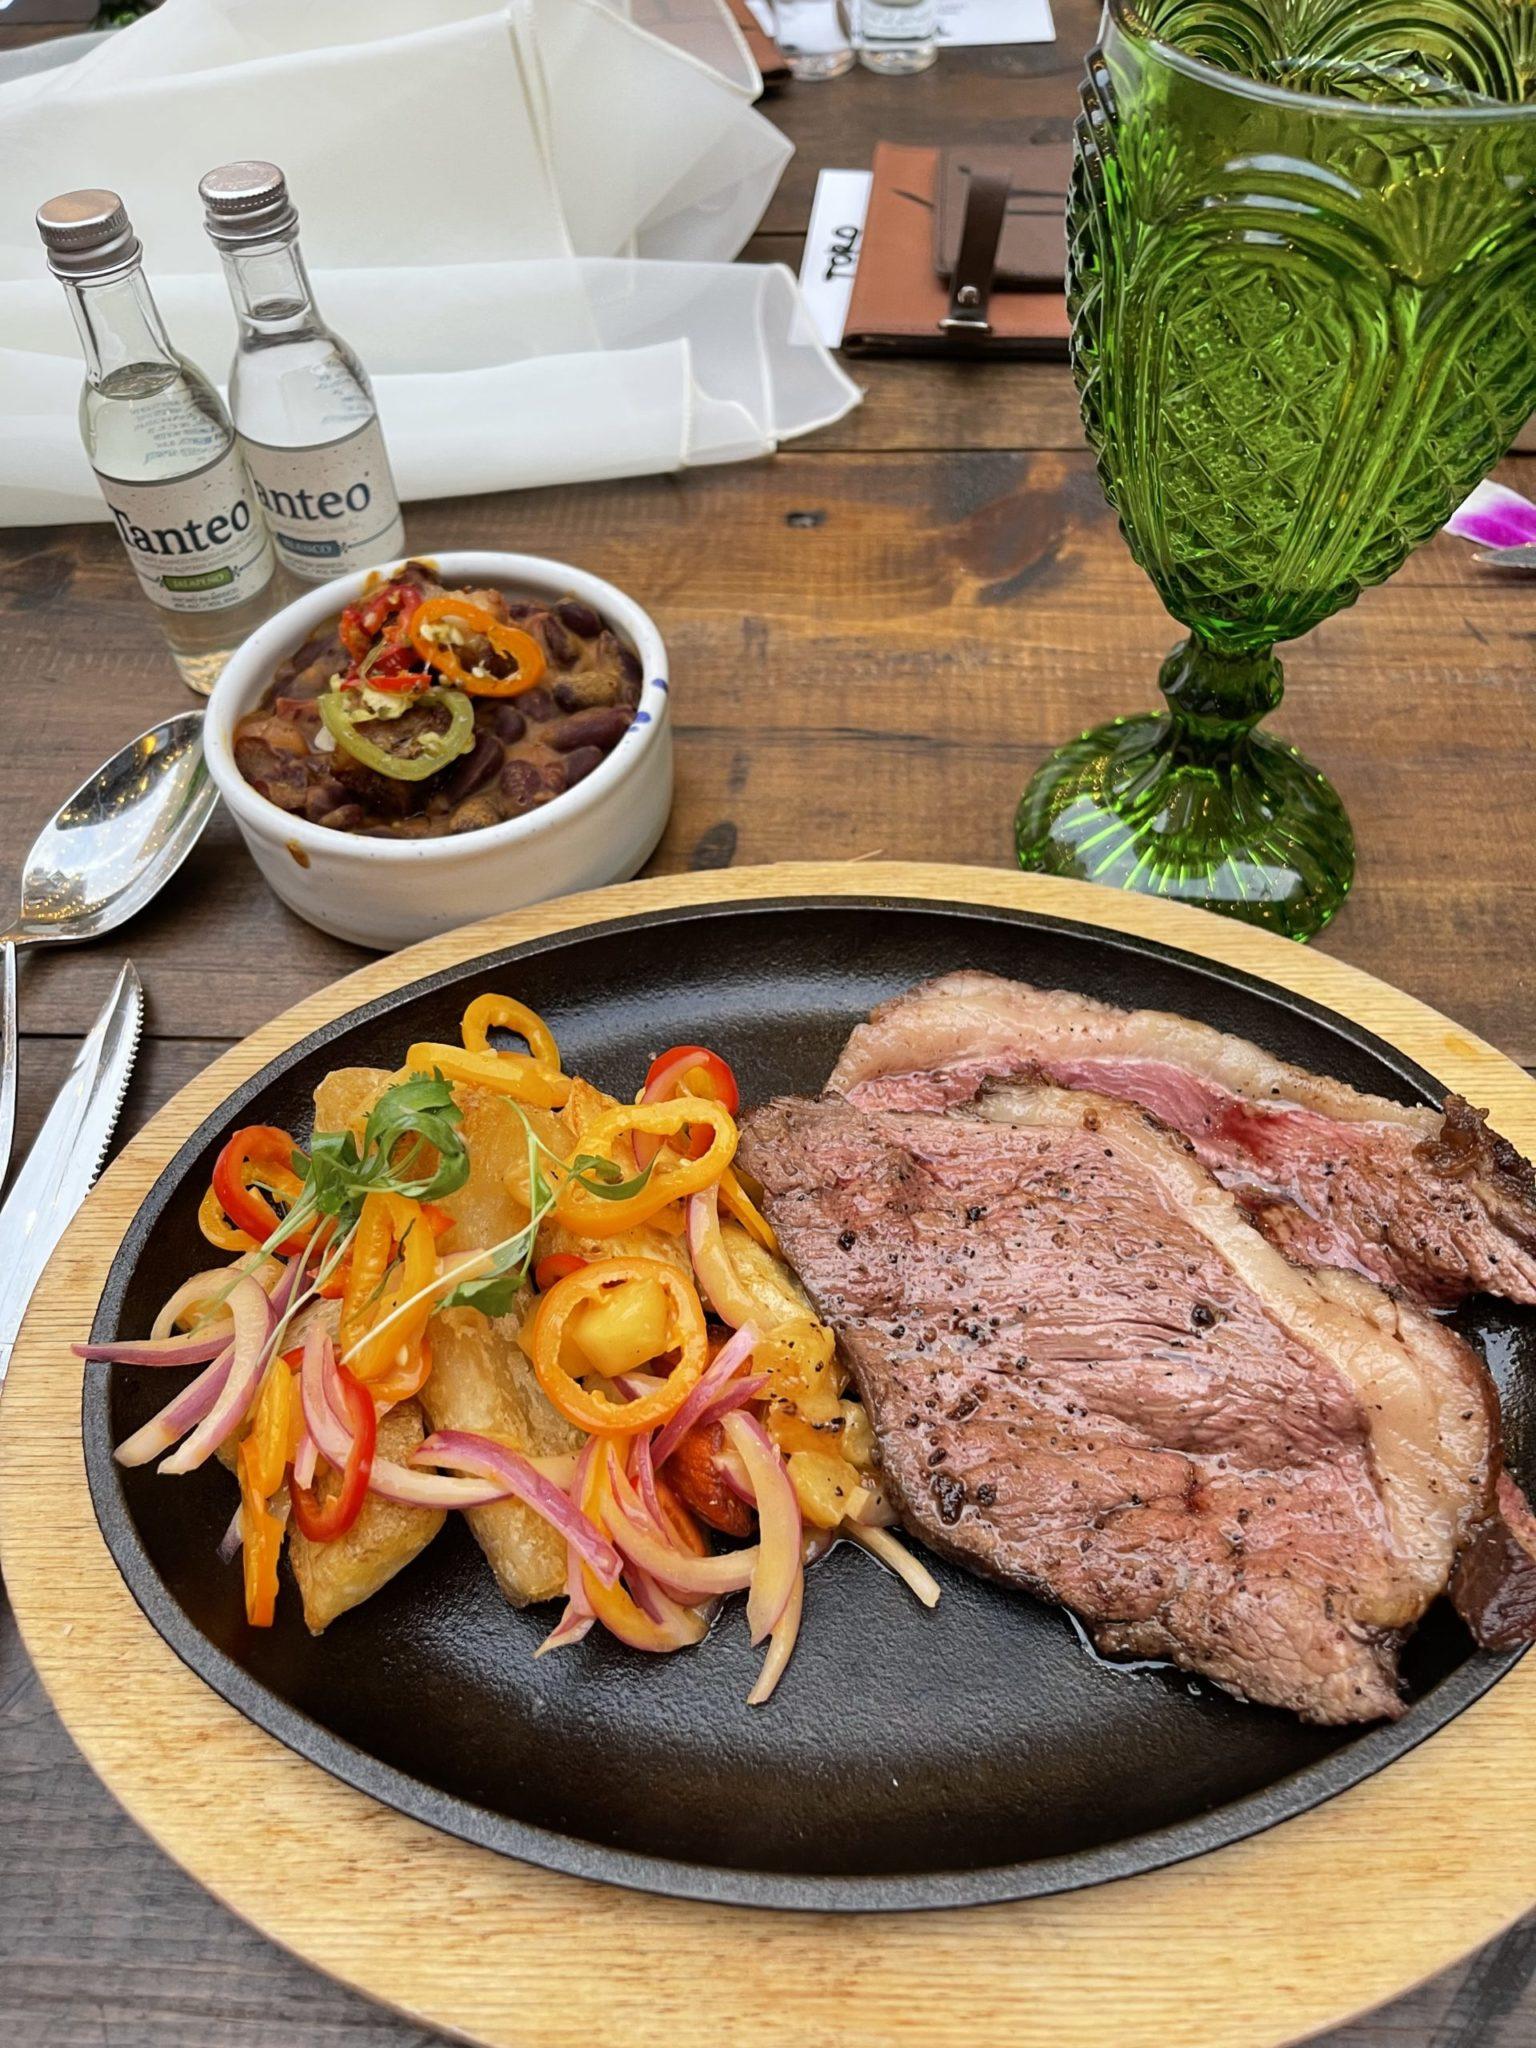 Toro Latin Kitchen and Lounge Cherry Creek North Denver Colorado Chef Richard Sandoval Chef Oscar Padilla 2021 Menu Items